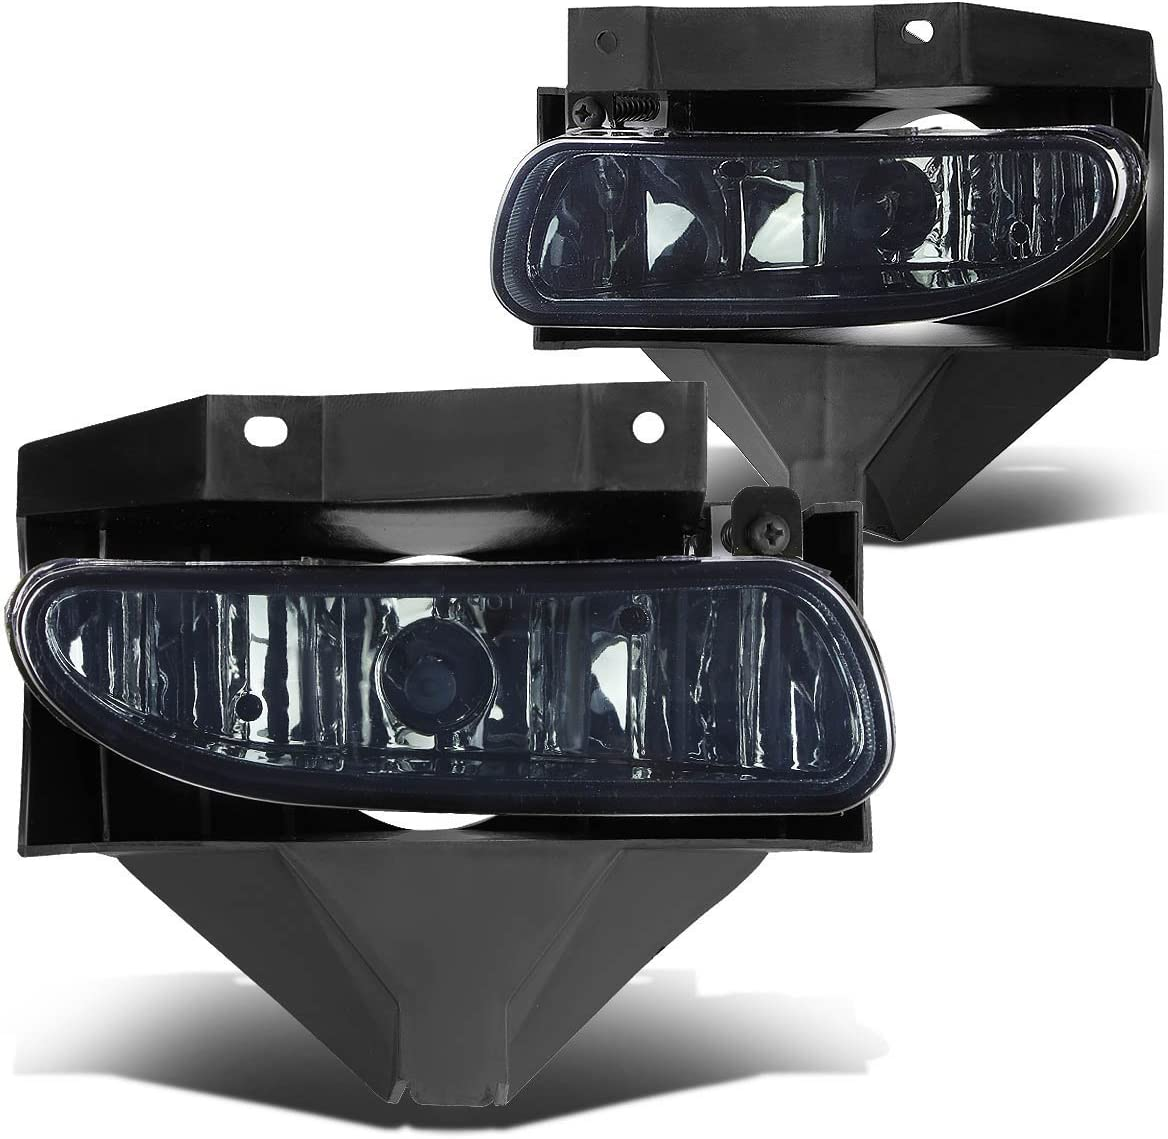 Smoked DNA motoring FL-ZTL-115-SM Front Bumper Fog Light Pack of 1